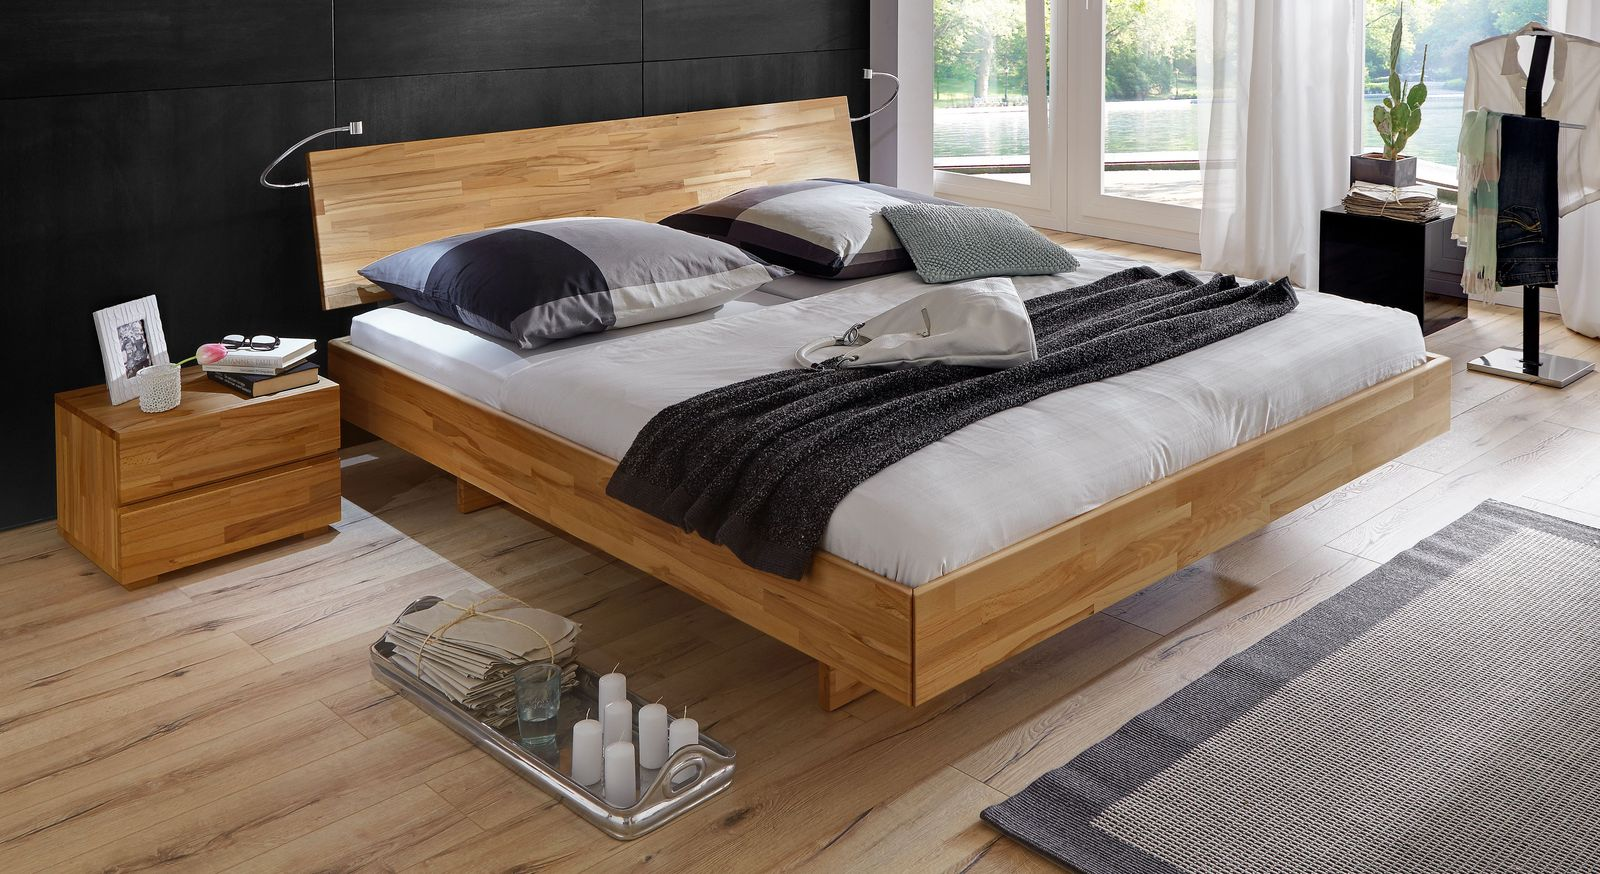 Bett Rimini mit 38 cm Rahmenhöhe aus Kernbuche